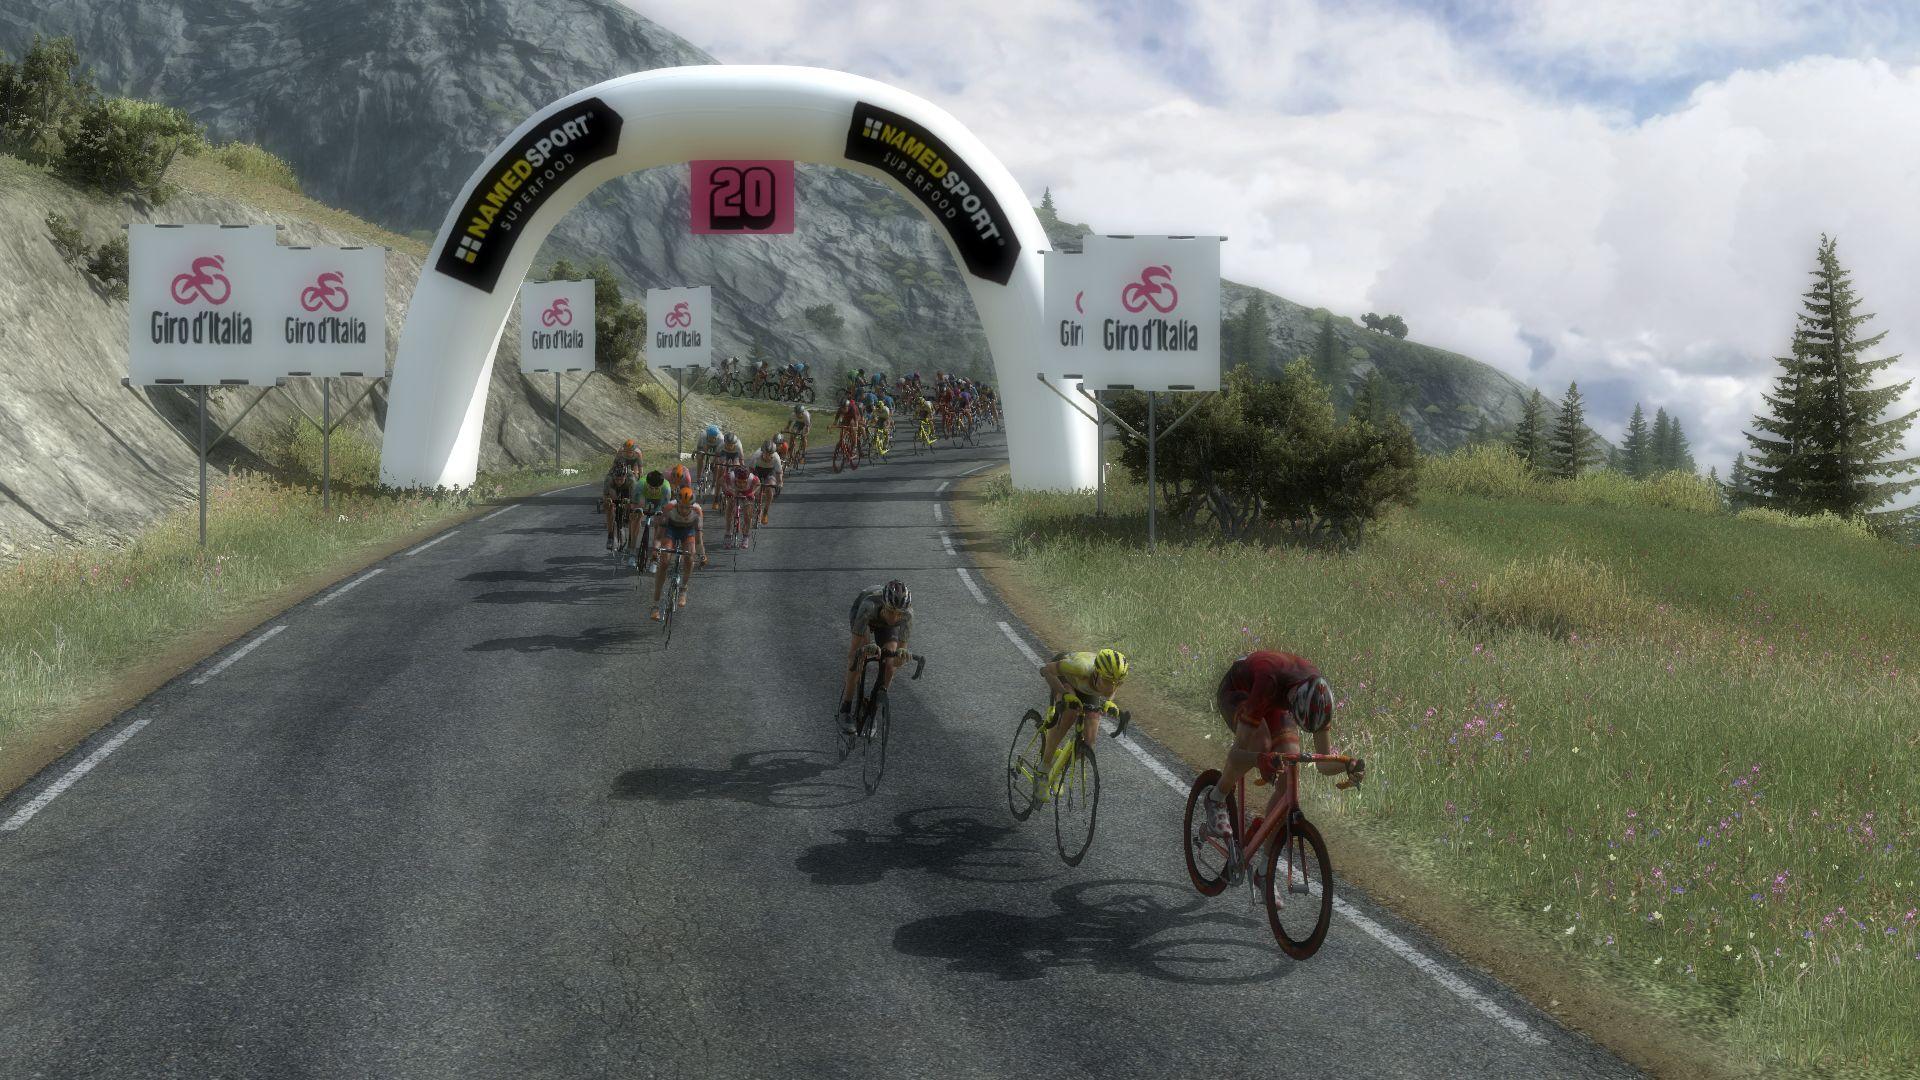 pcmdaily.com/images/mg/2020/Reports/GTM/Giro/S20/mg20_giro_s20_065.jpg